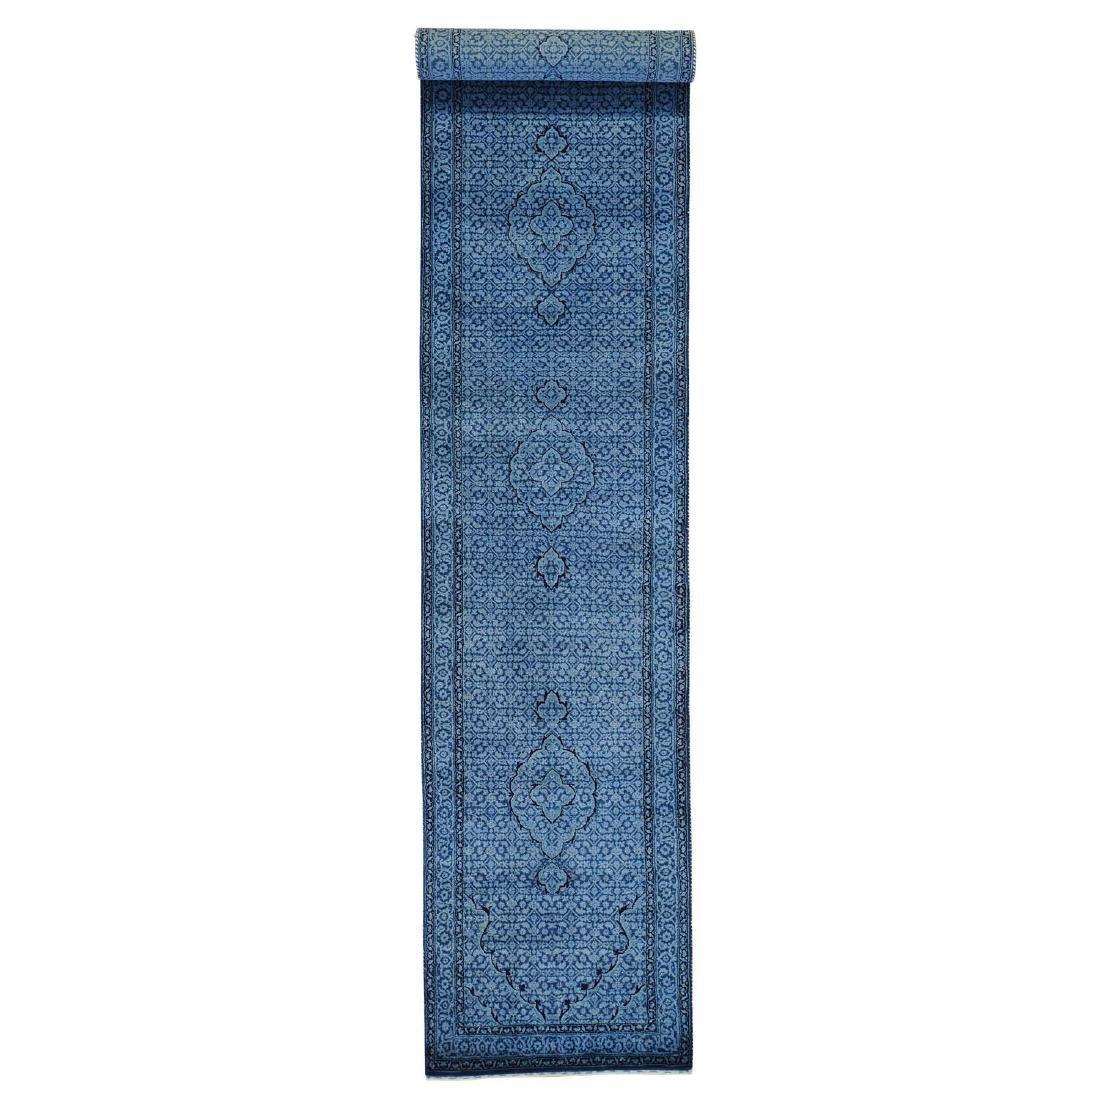 Wool and Silk Tabriz Mahi Runner Oriental Rug Handmade